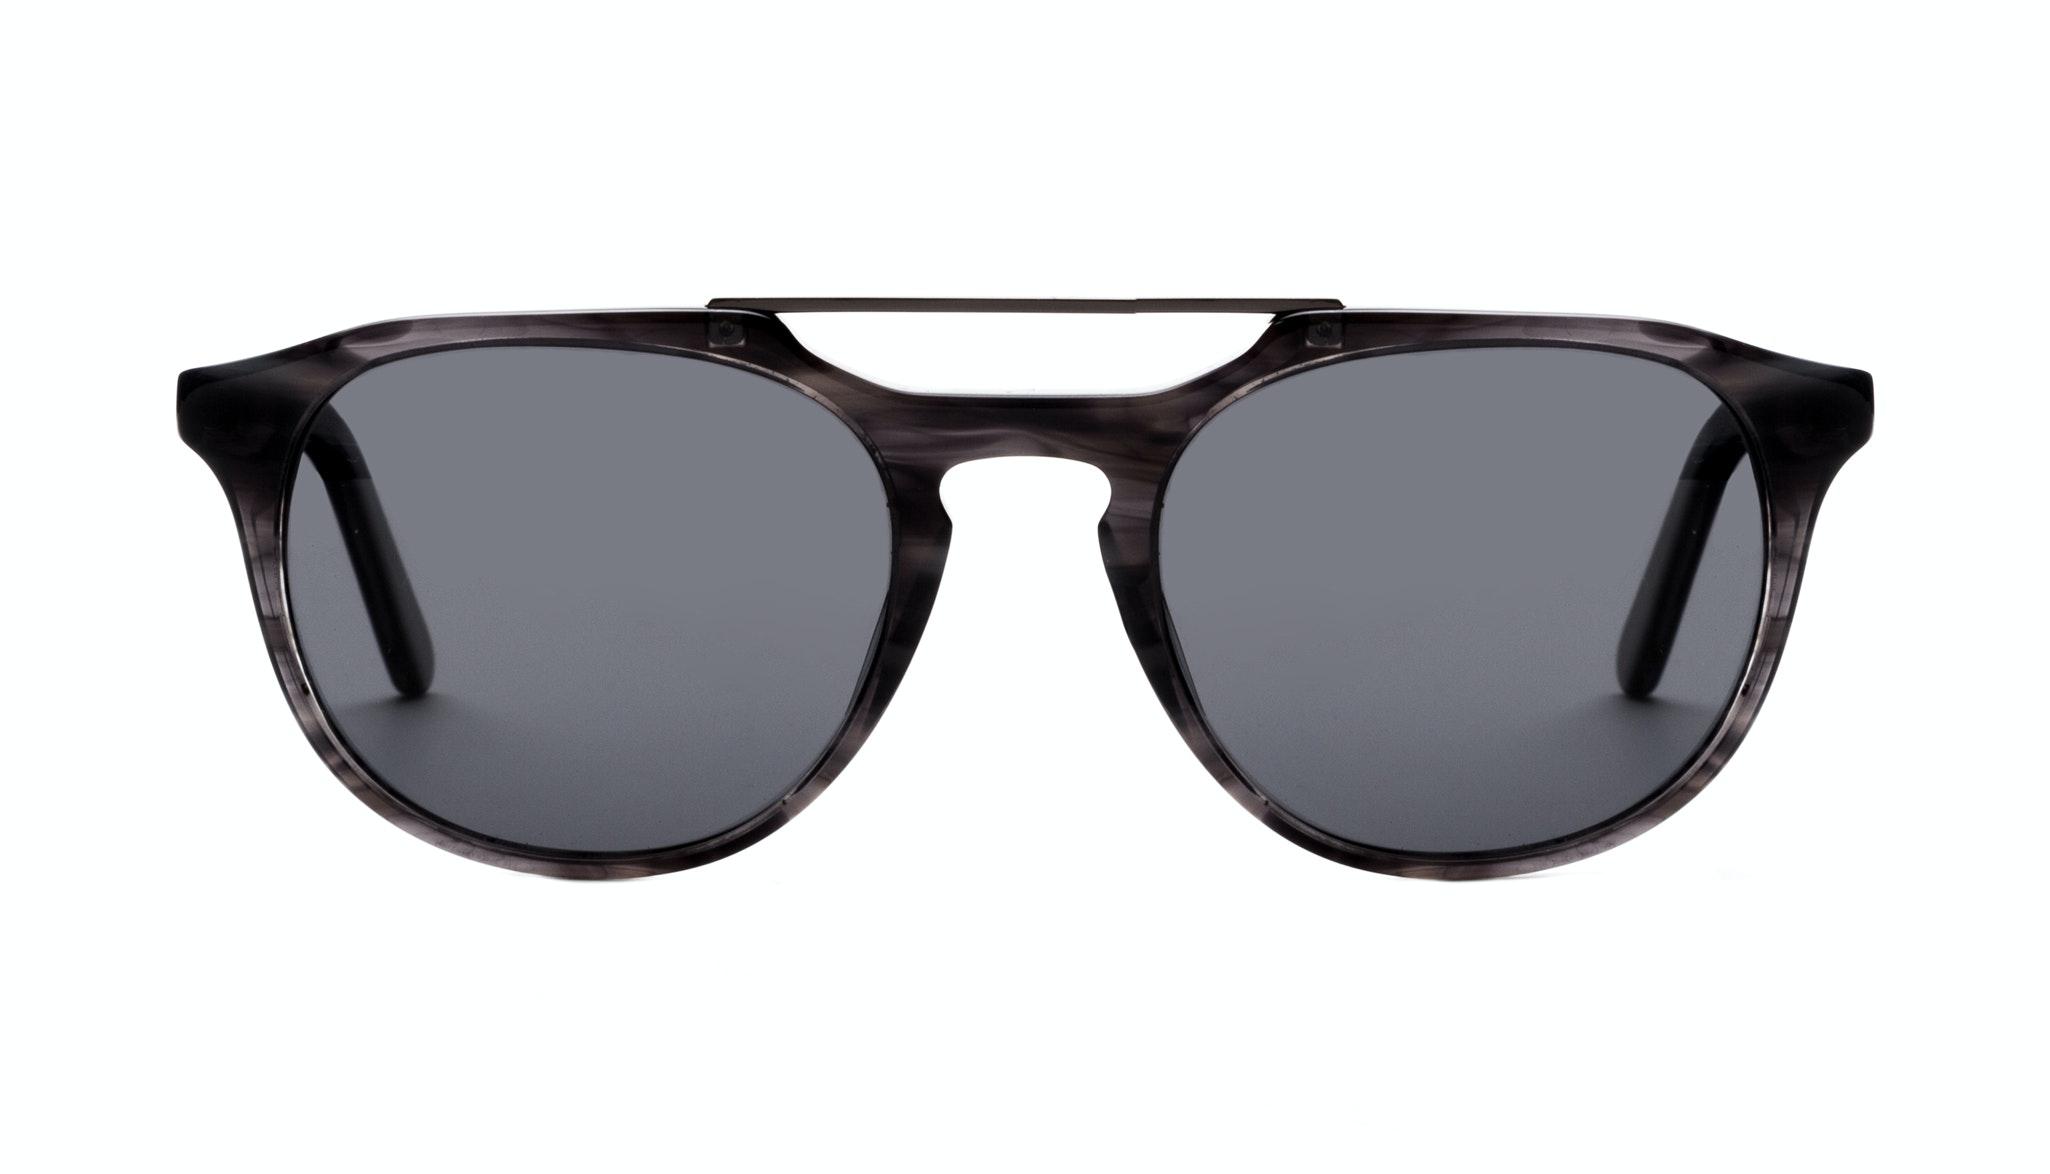 Affordable Fashion Glasses Aviator Rectangle Sunglasses Men Copenhagen Black Smoke